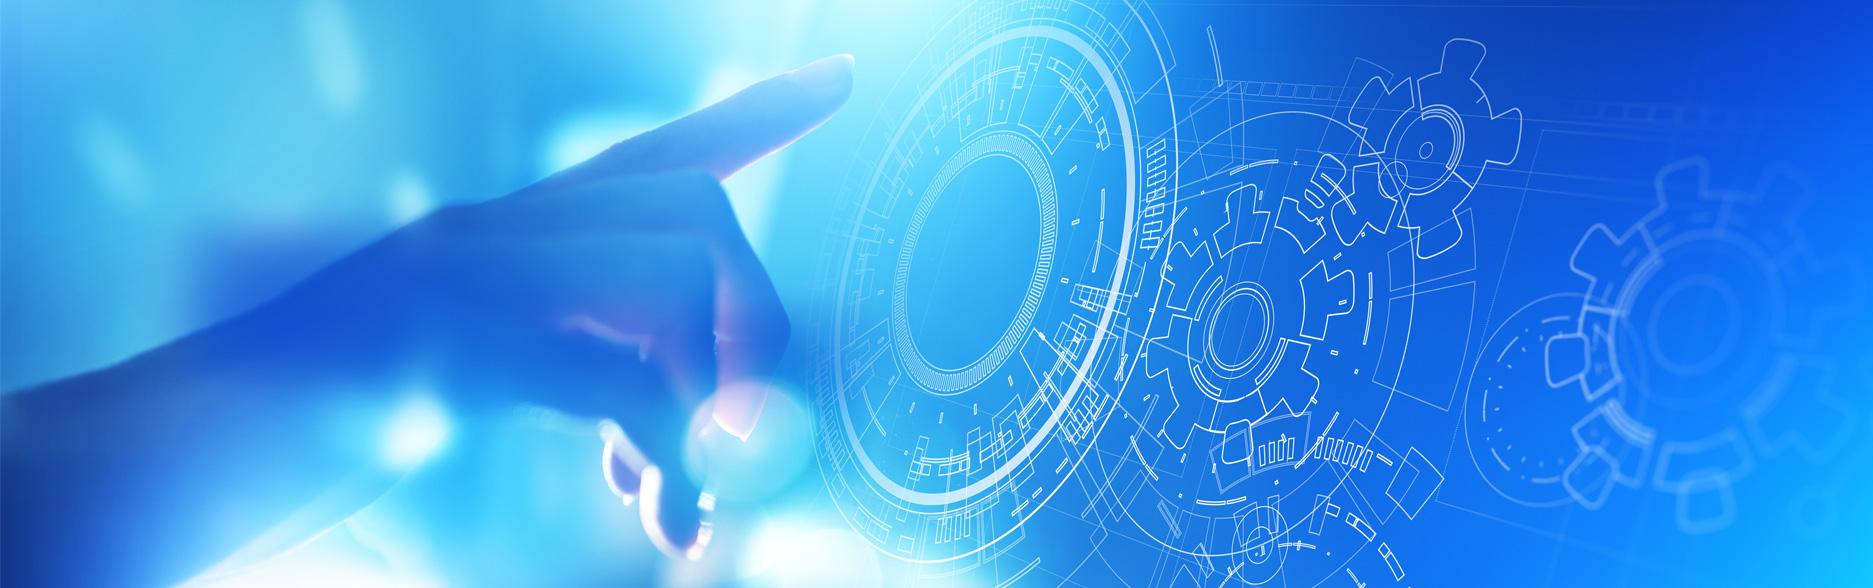 base-slide-design-tecnologia